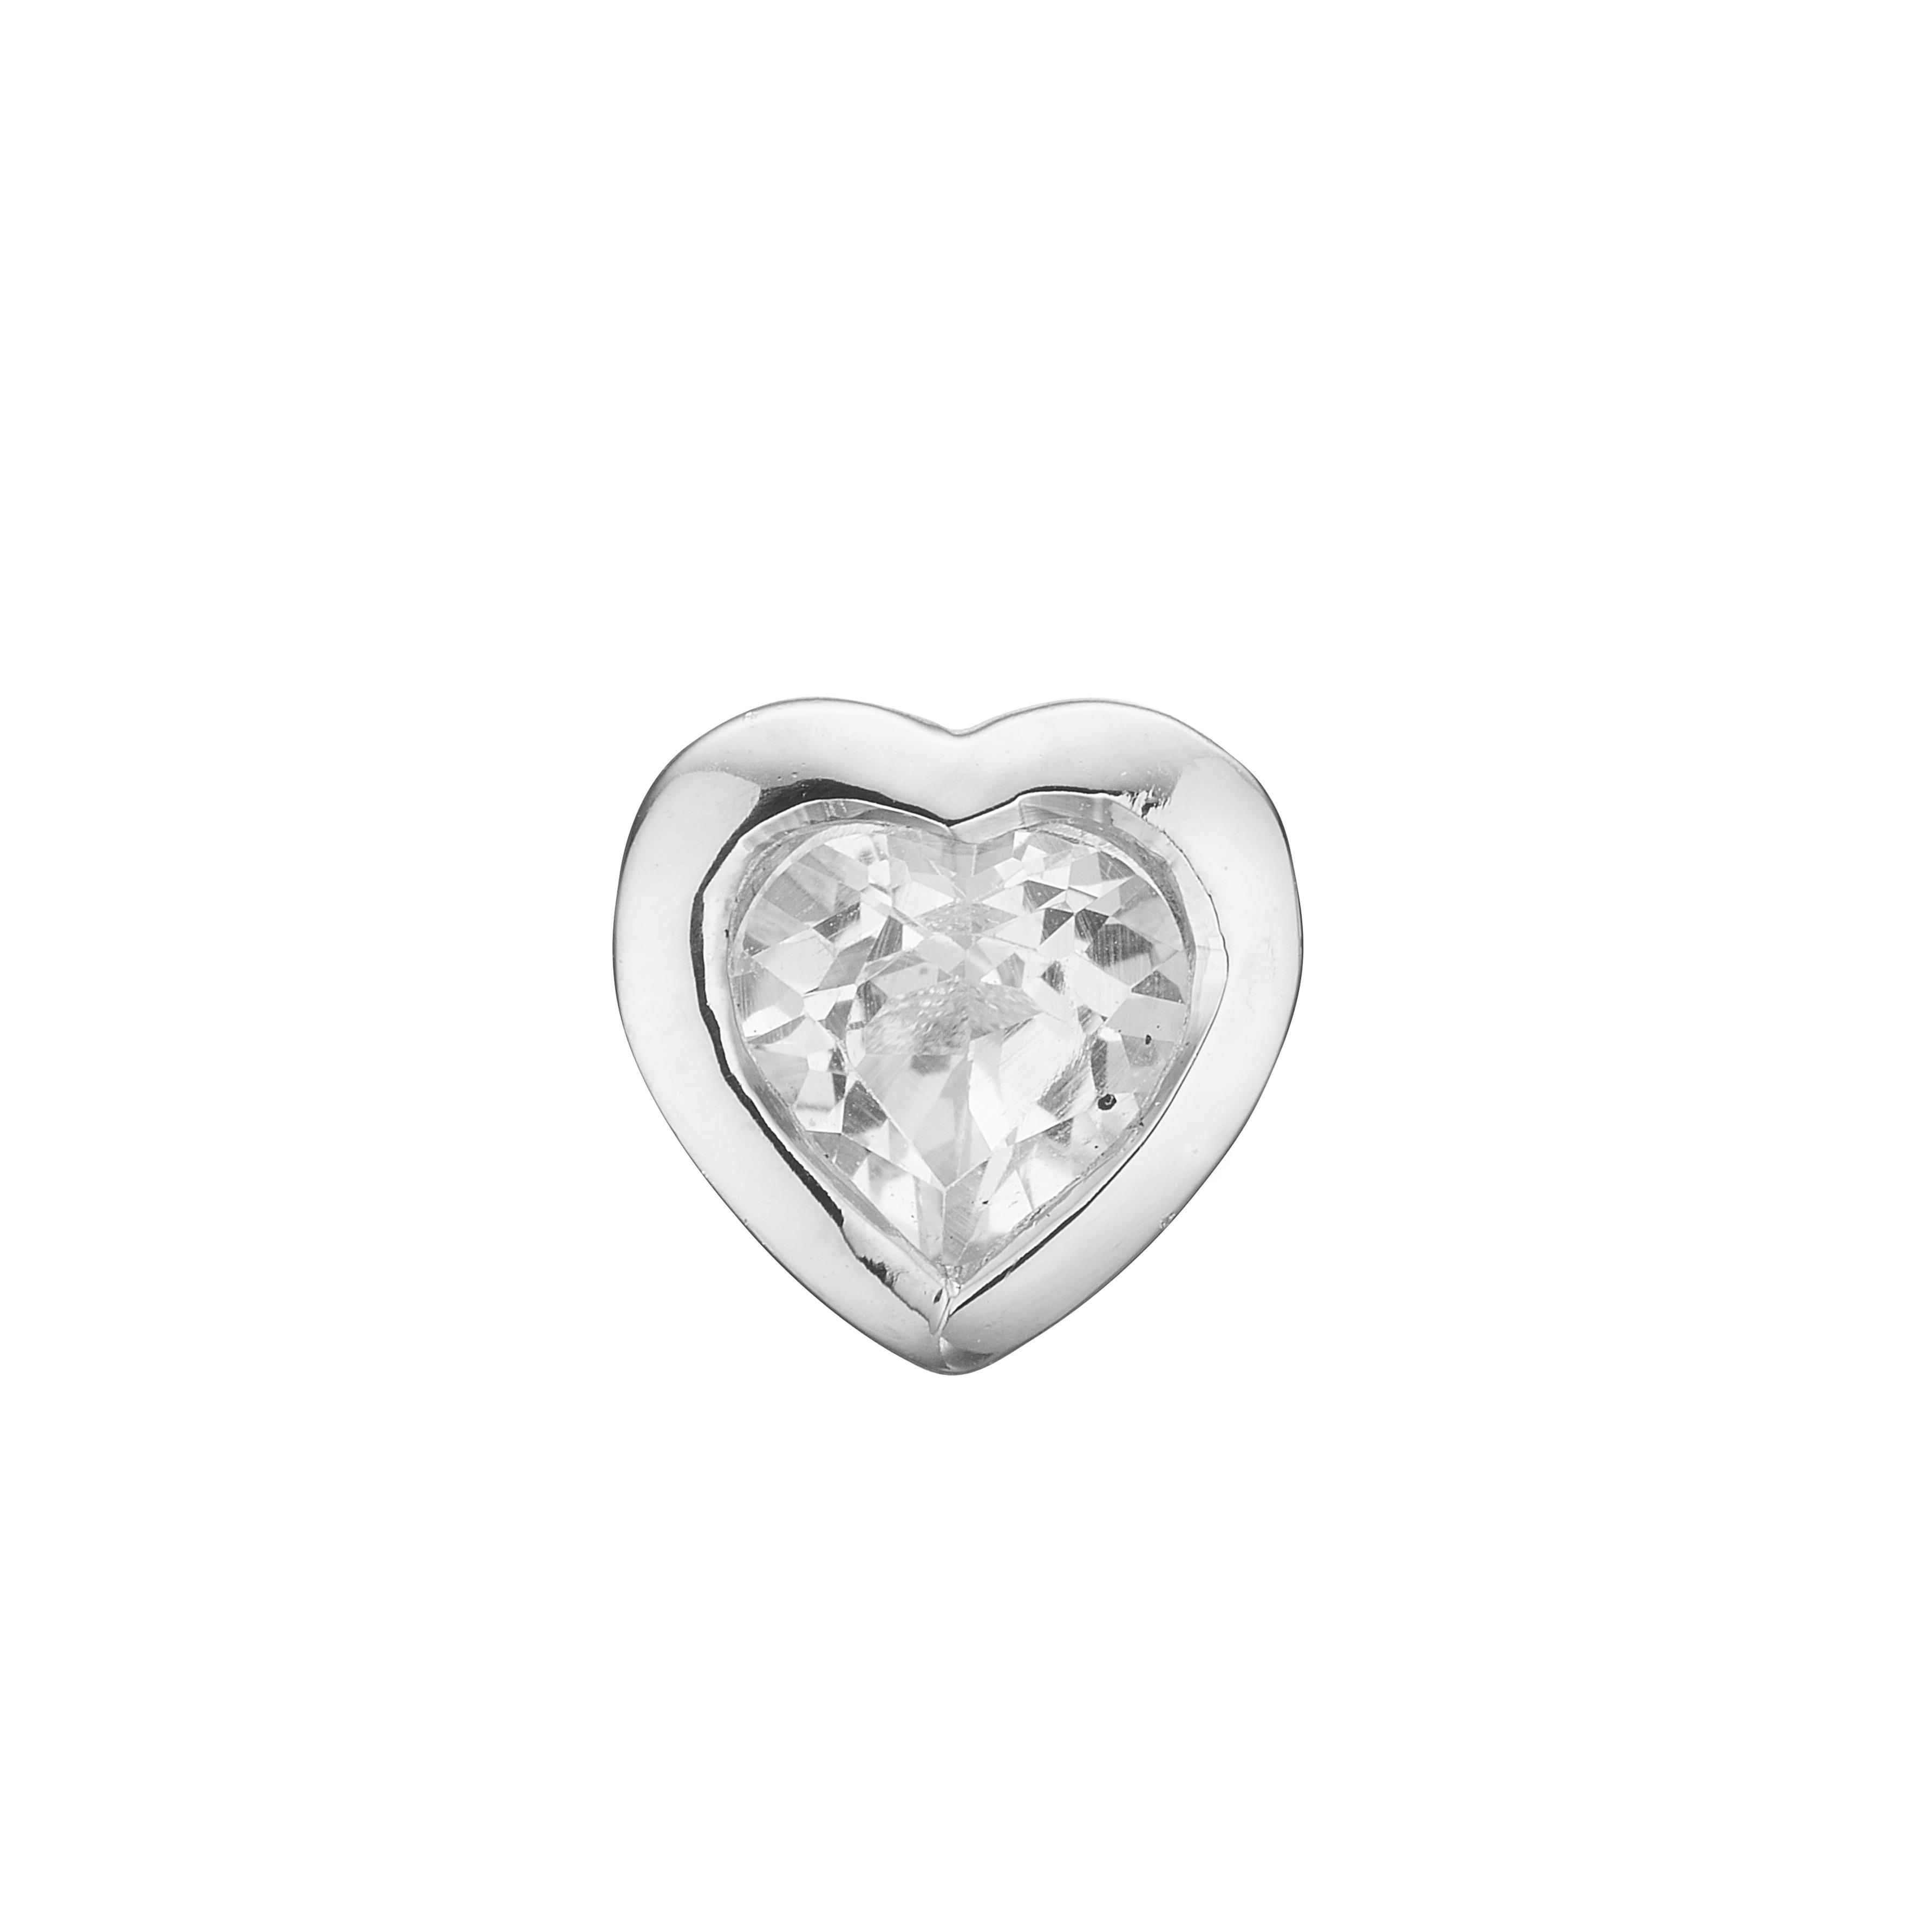 CHRISTINA Topaz Hearts - 671-S16